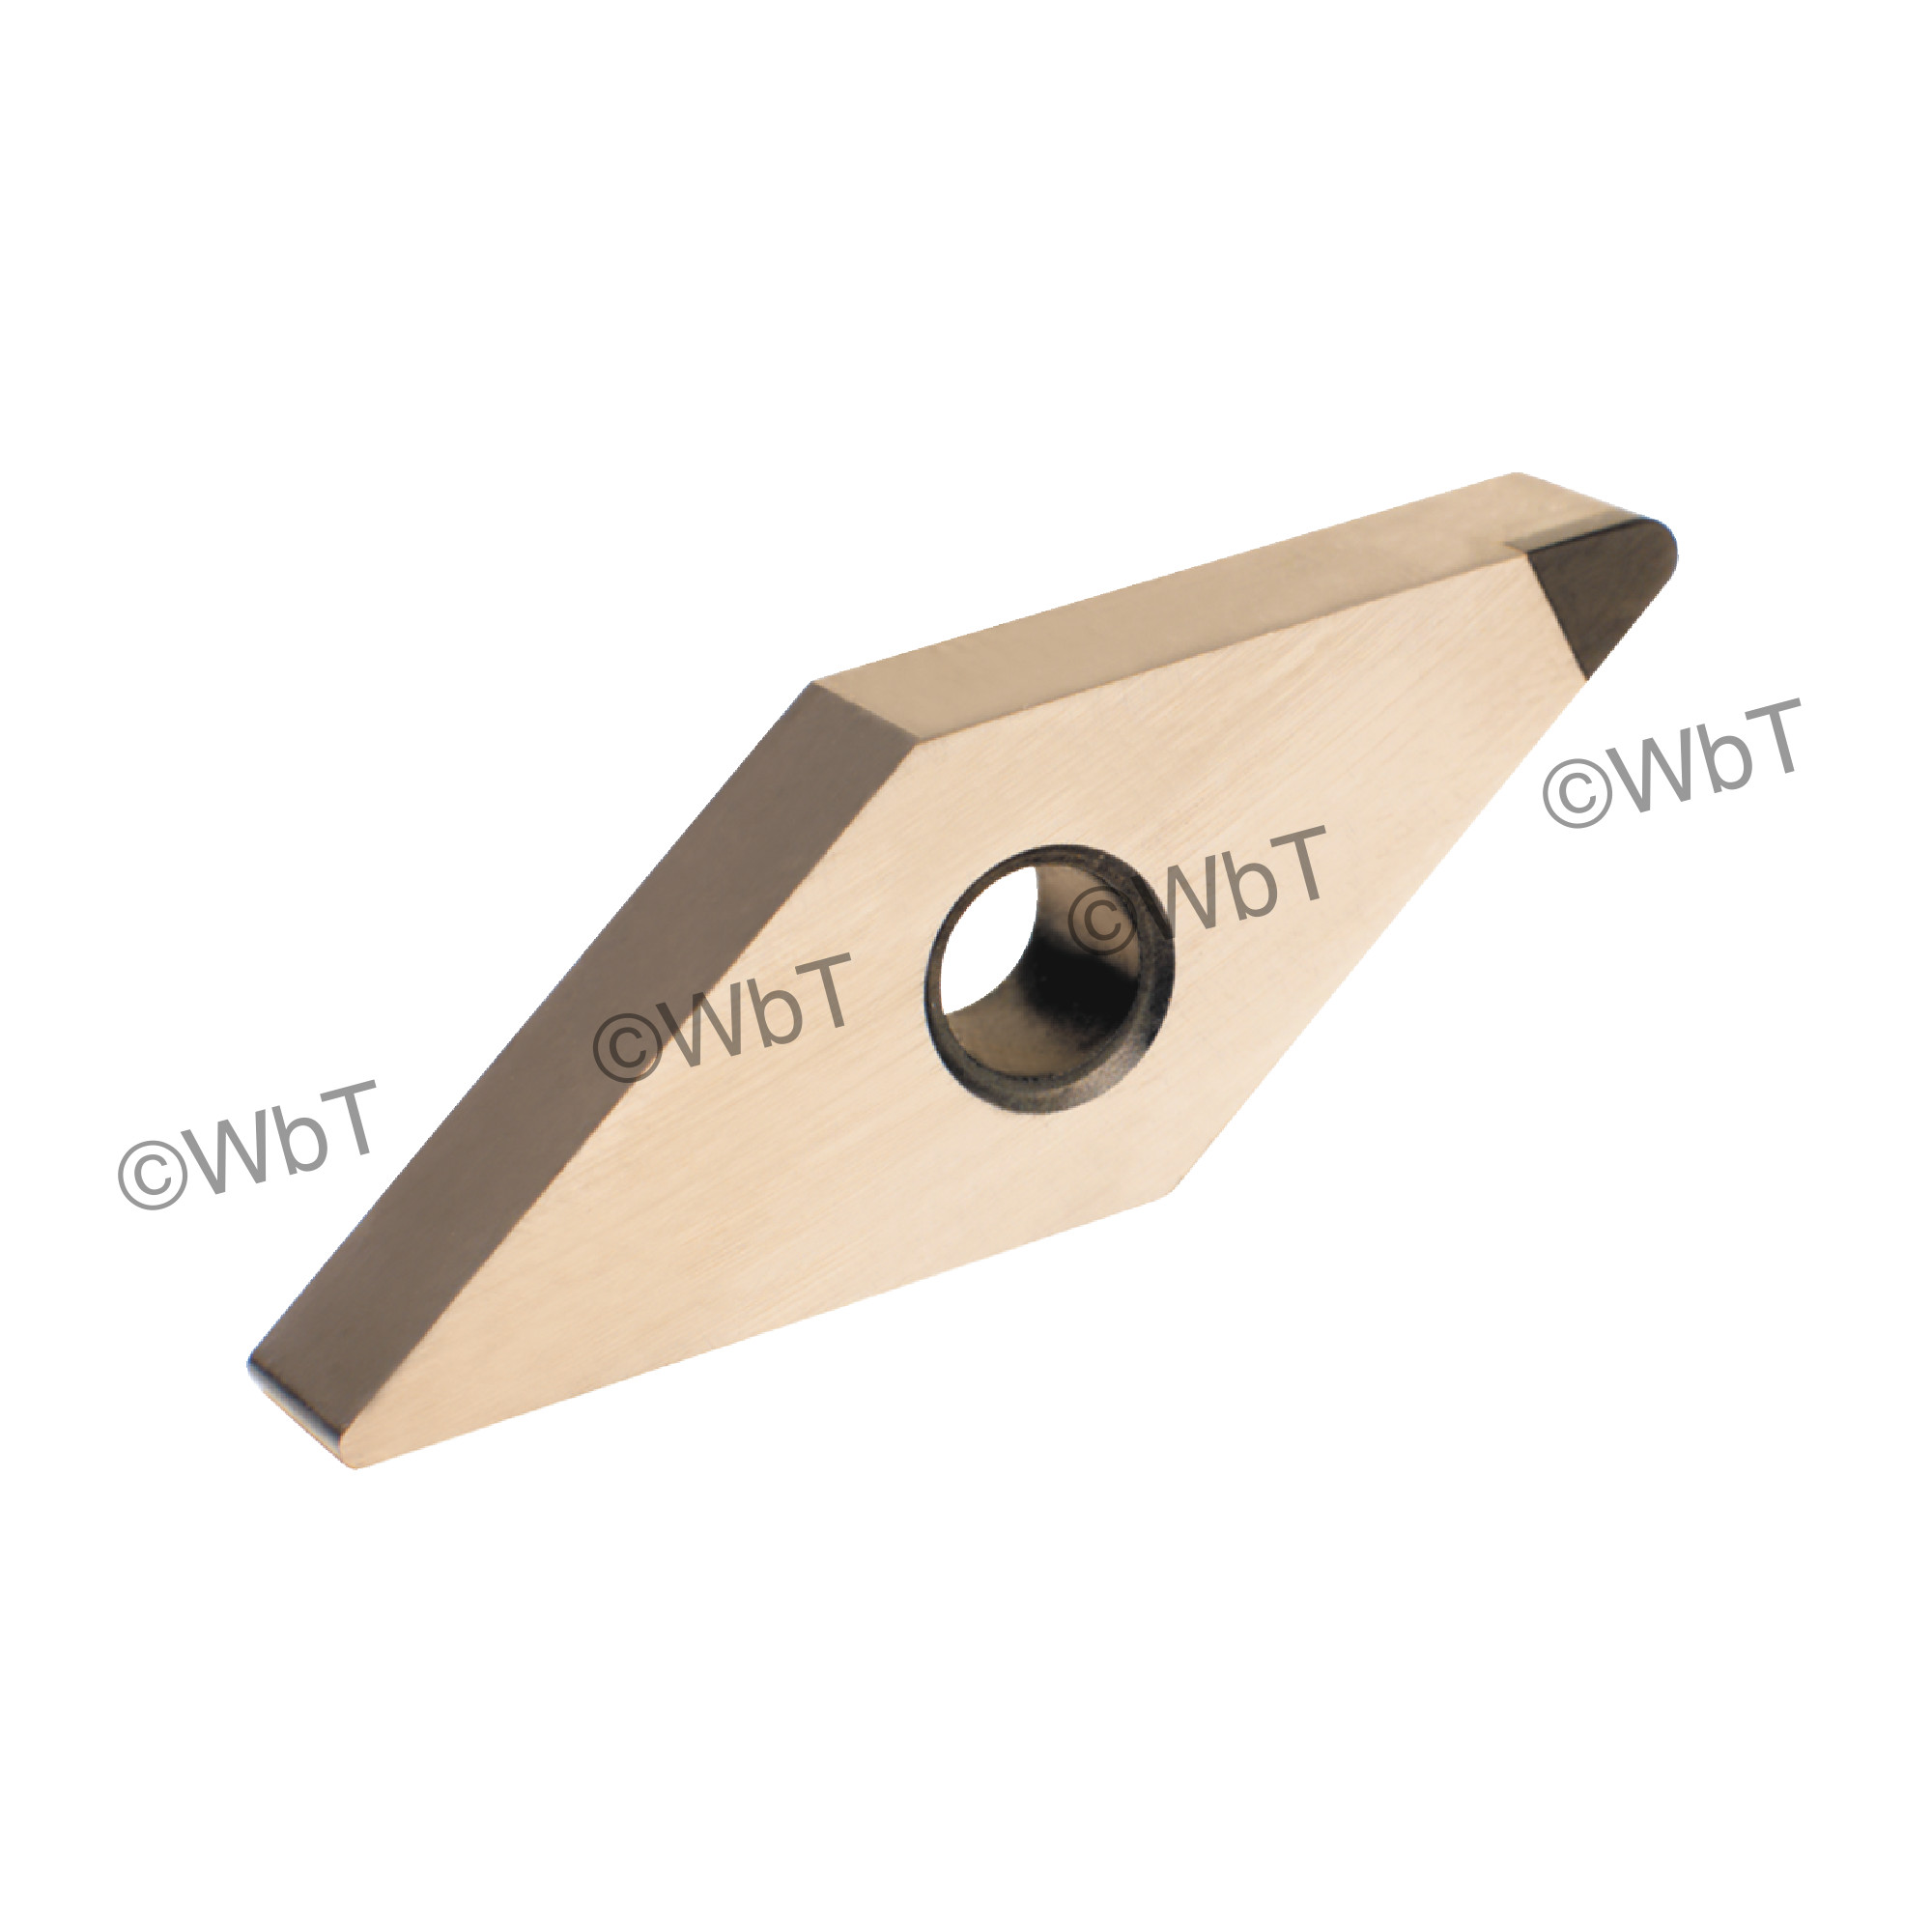 TTC PRODUCTION - VNGA331 CBN8 - 35° Diamond / Indexable CBN - Cubic Boron Nitride Turning Insert